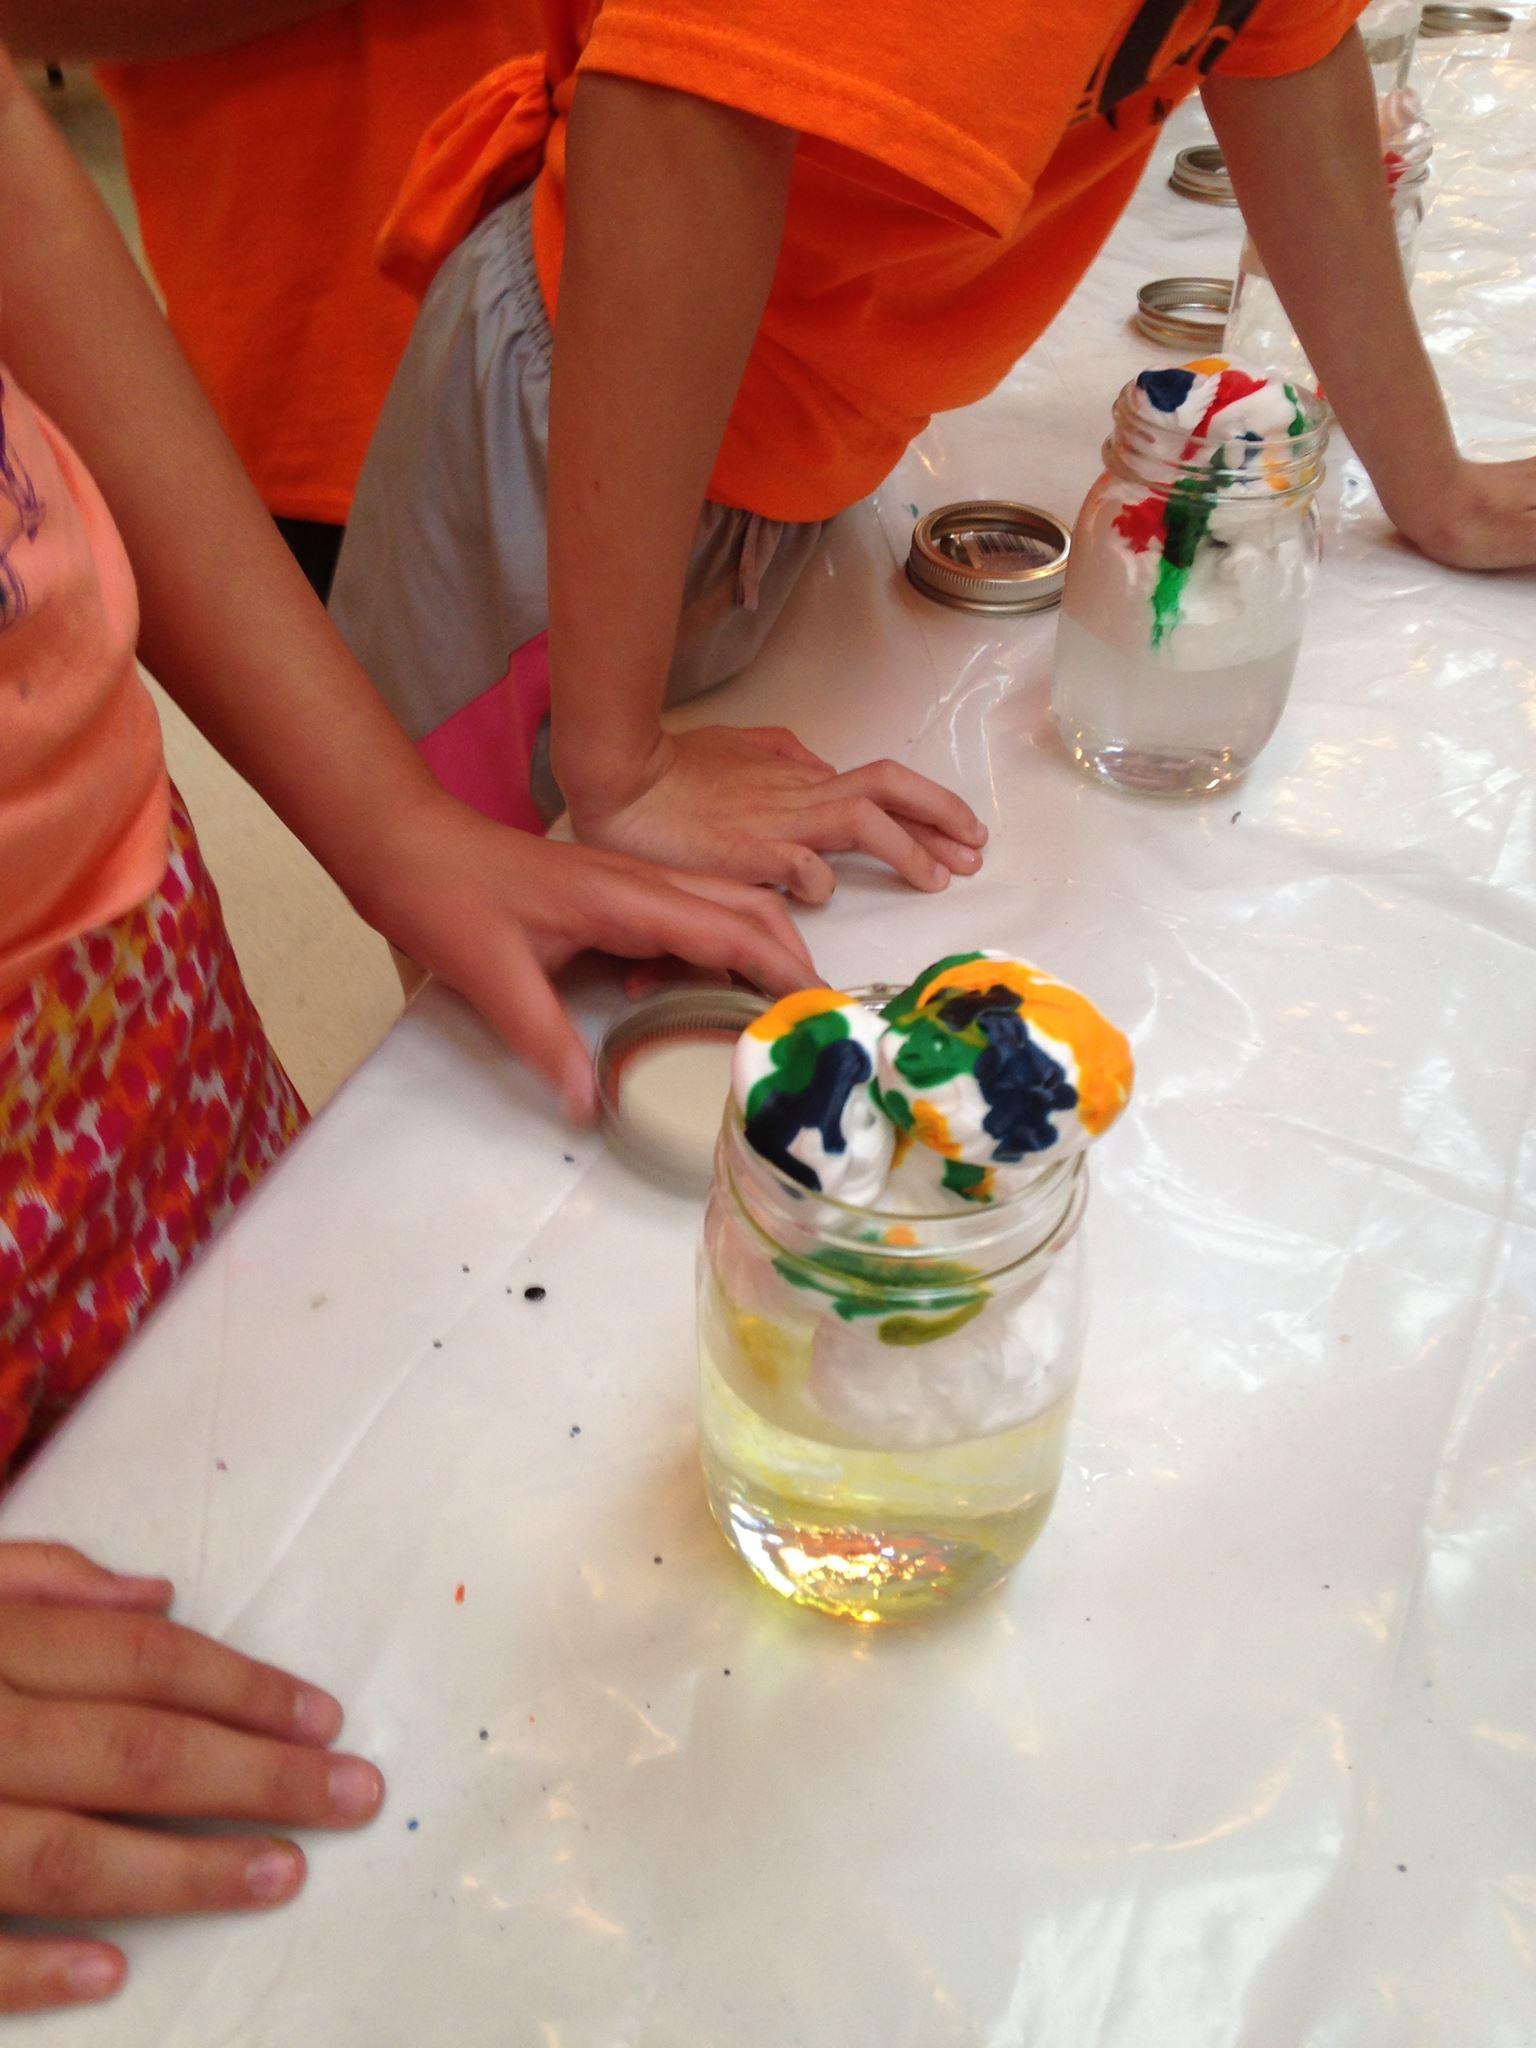 Art and Science meet at Art Camp.